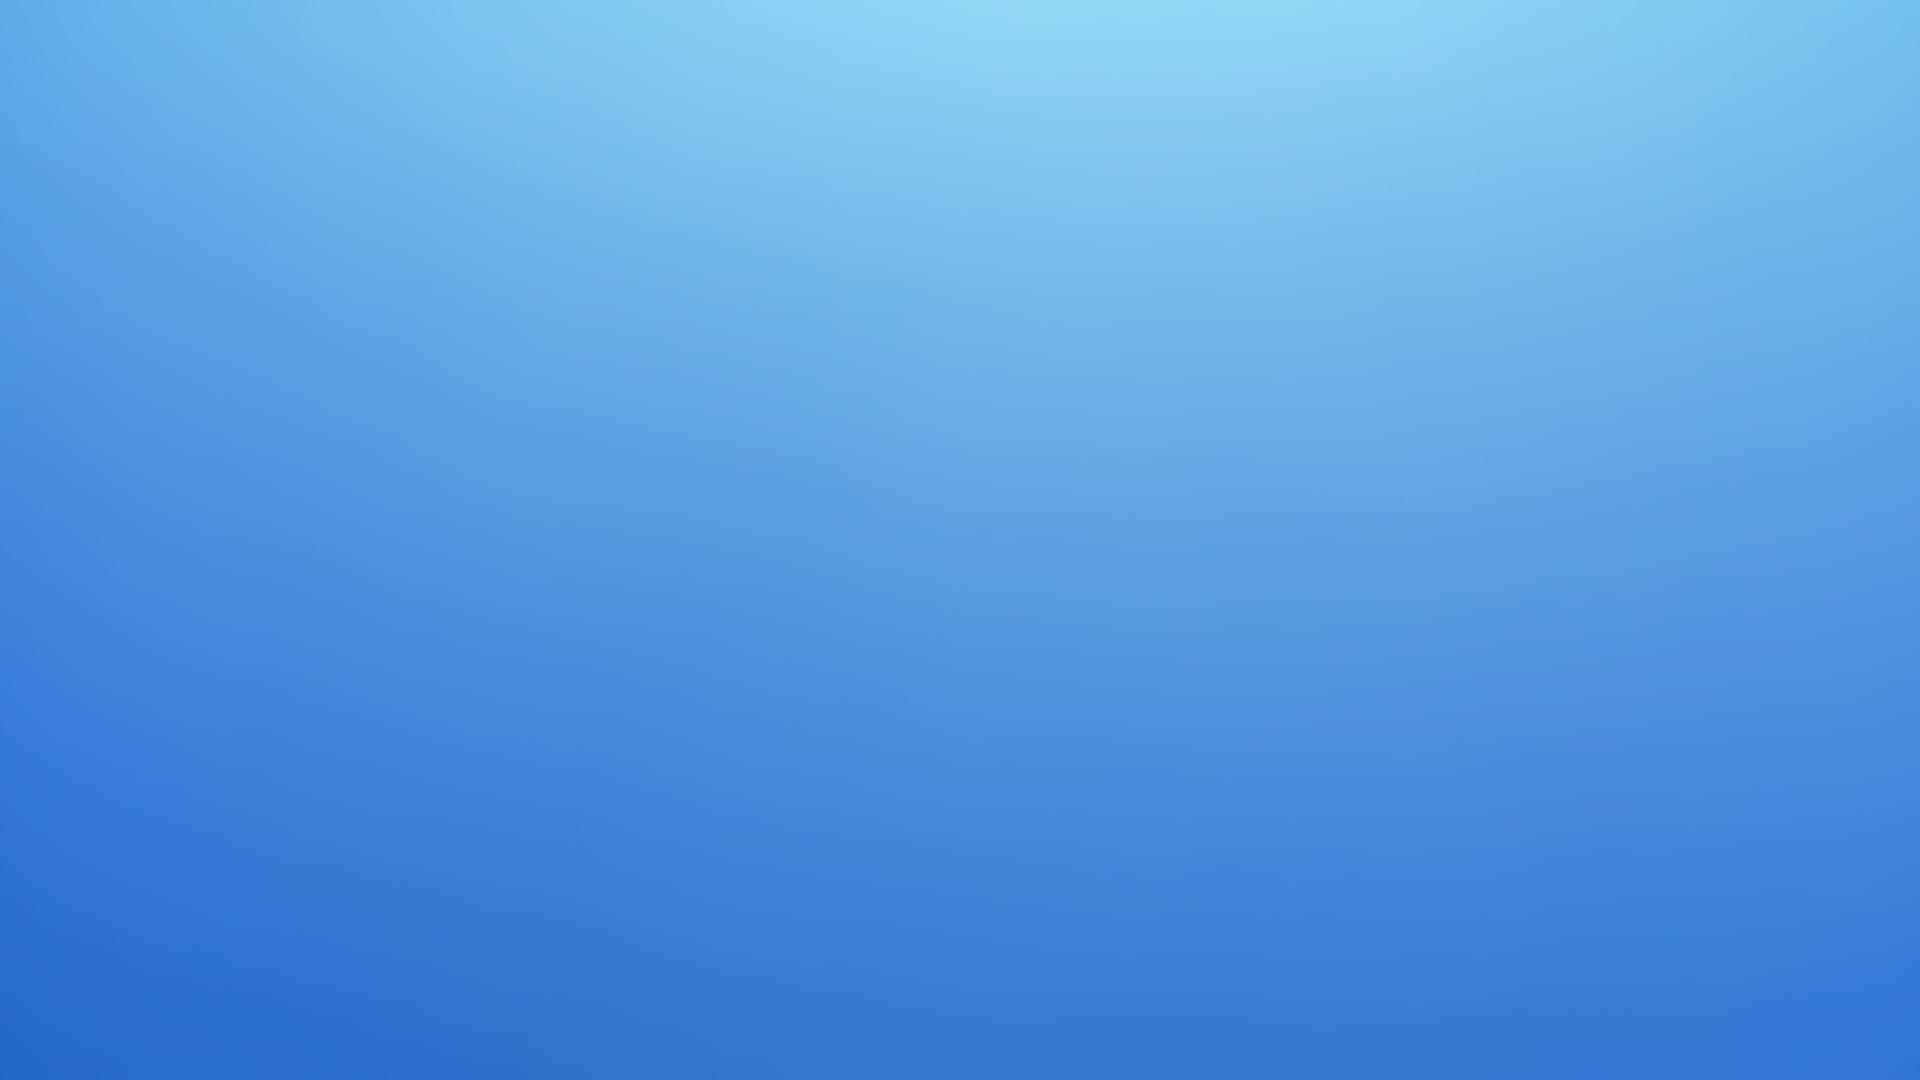 Light Blue Desktop Wallpaper 70 Images